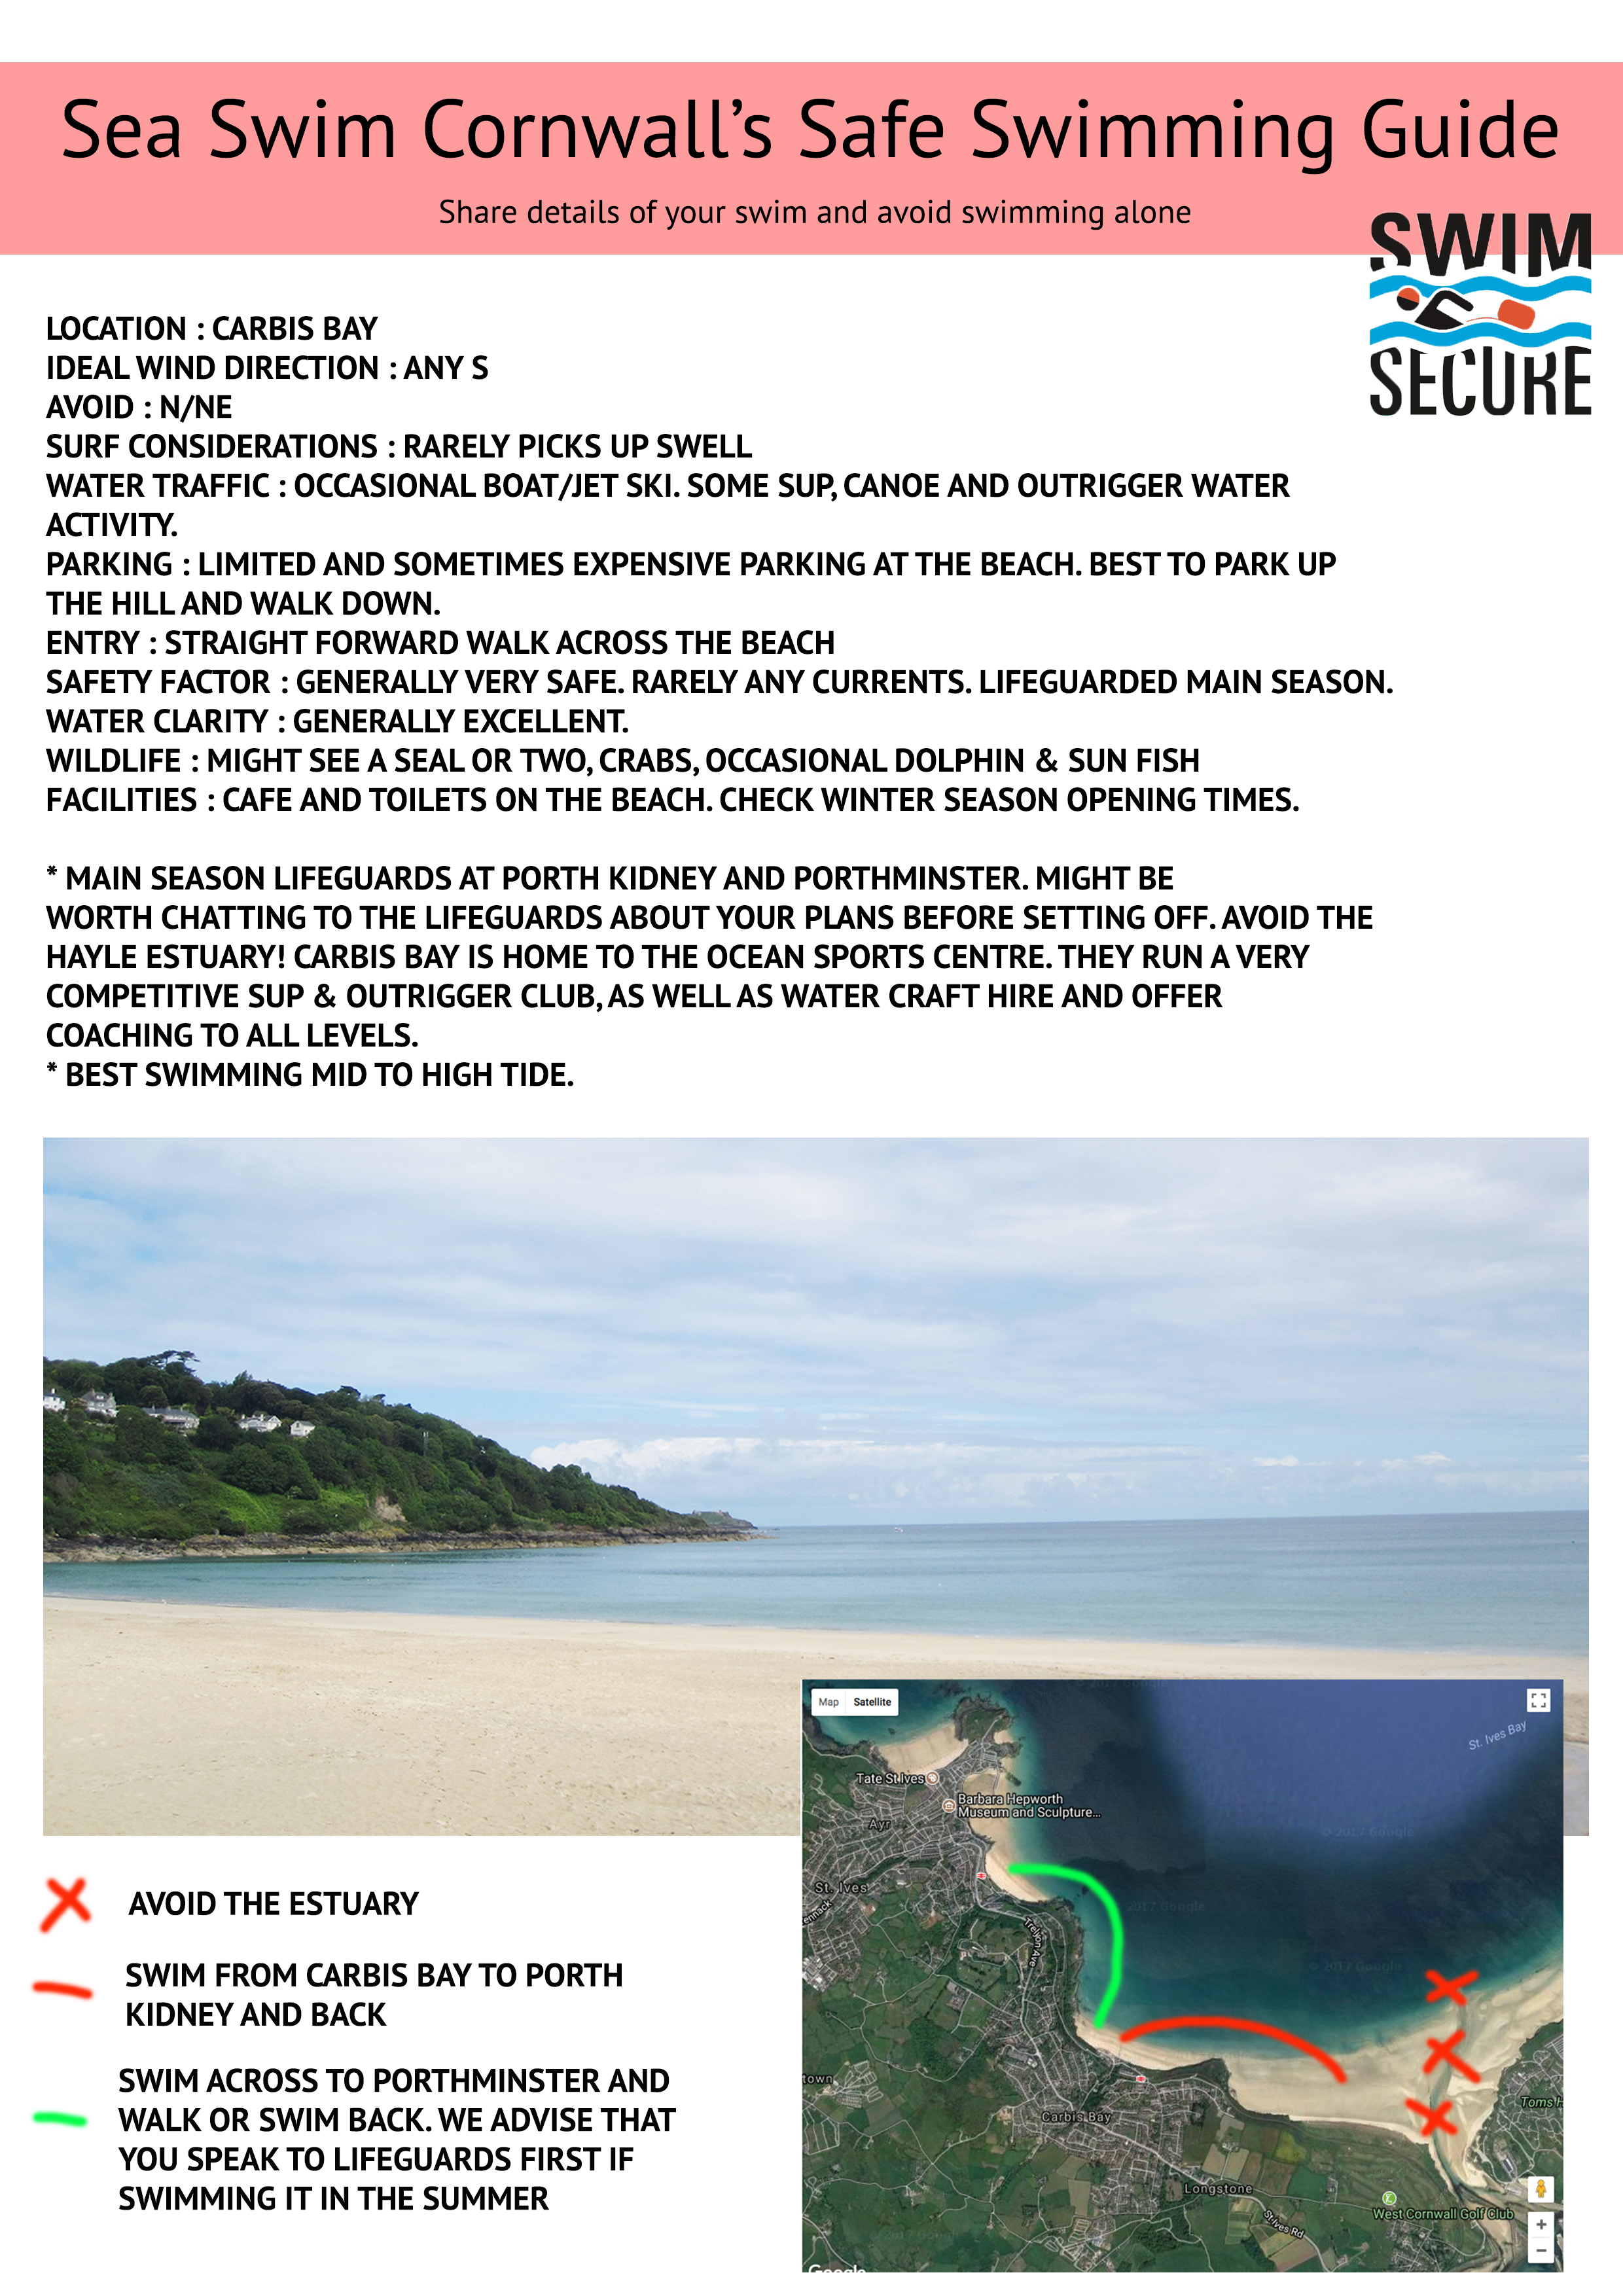 SSC - Safe Swim CARB BAY.jpg